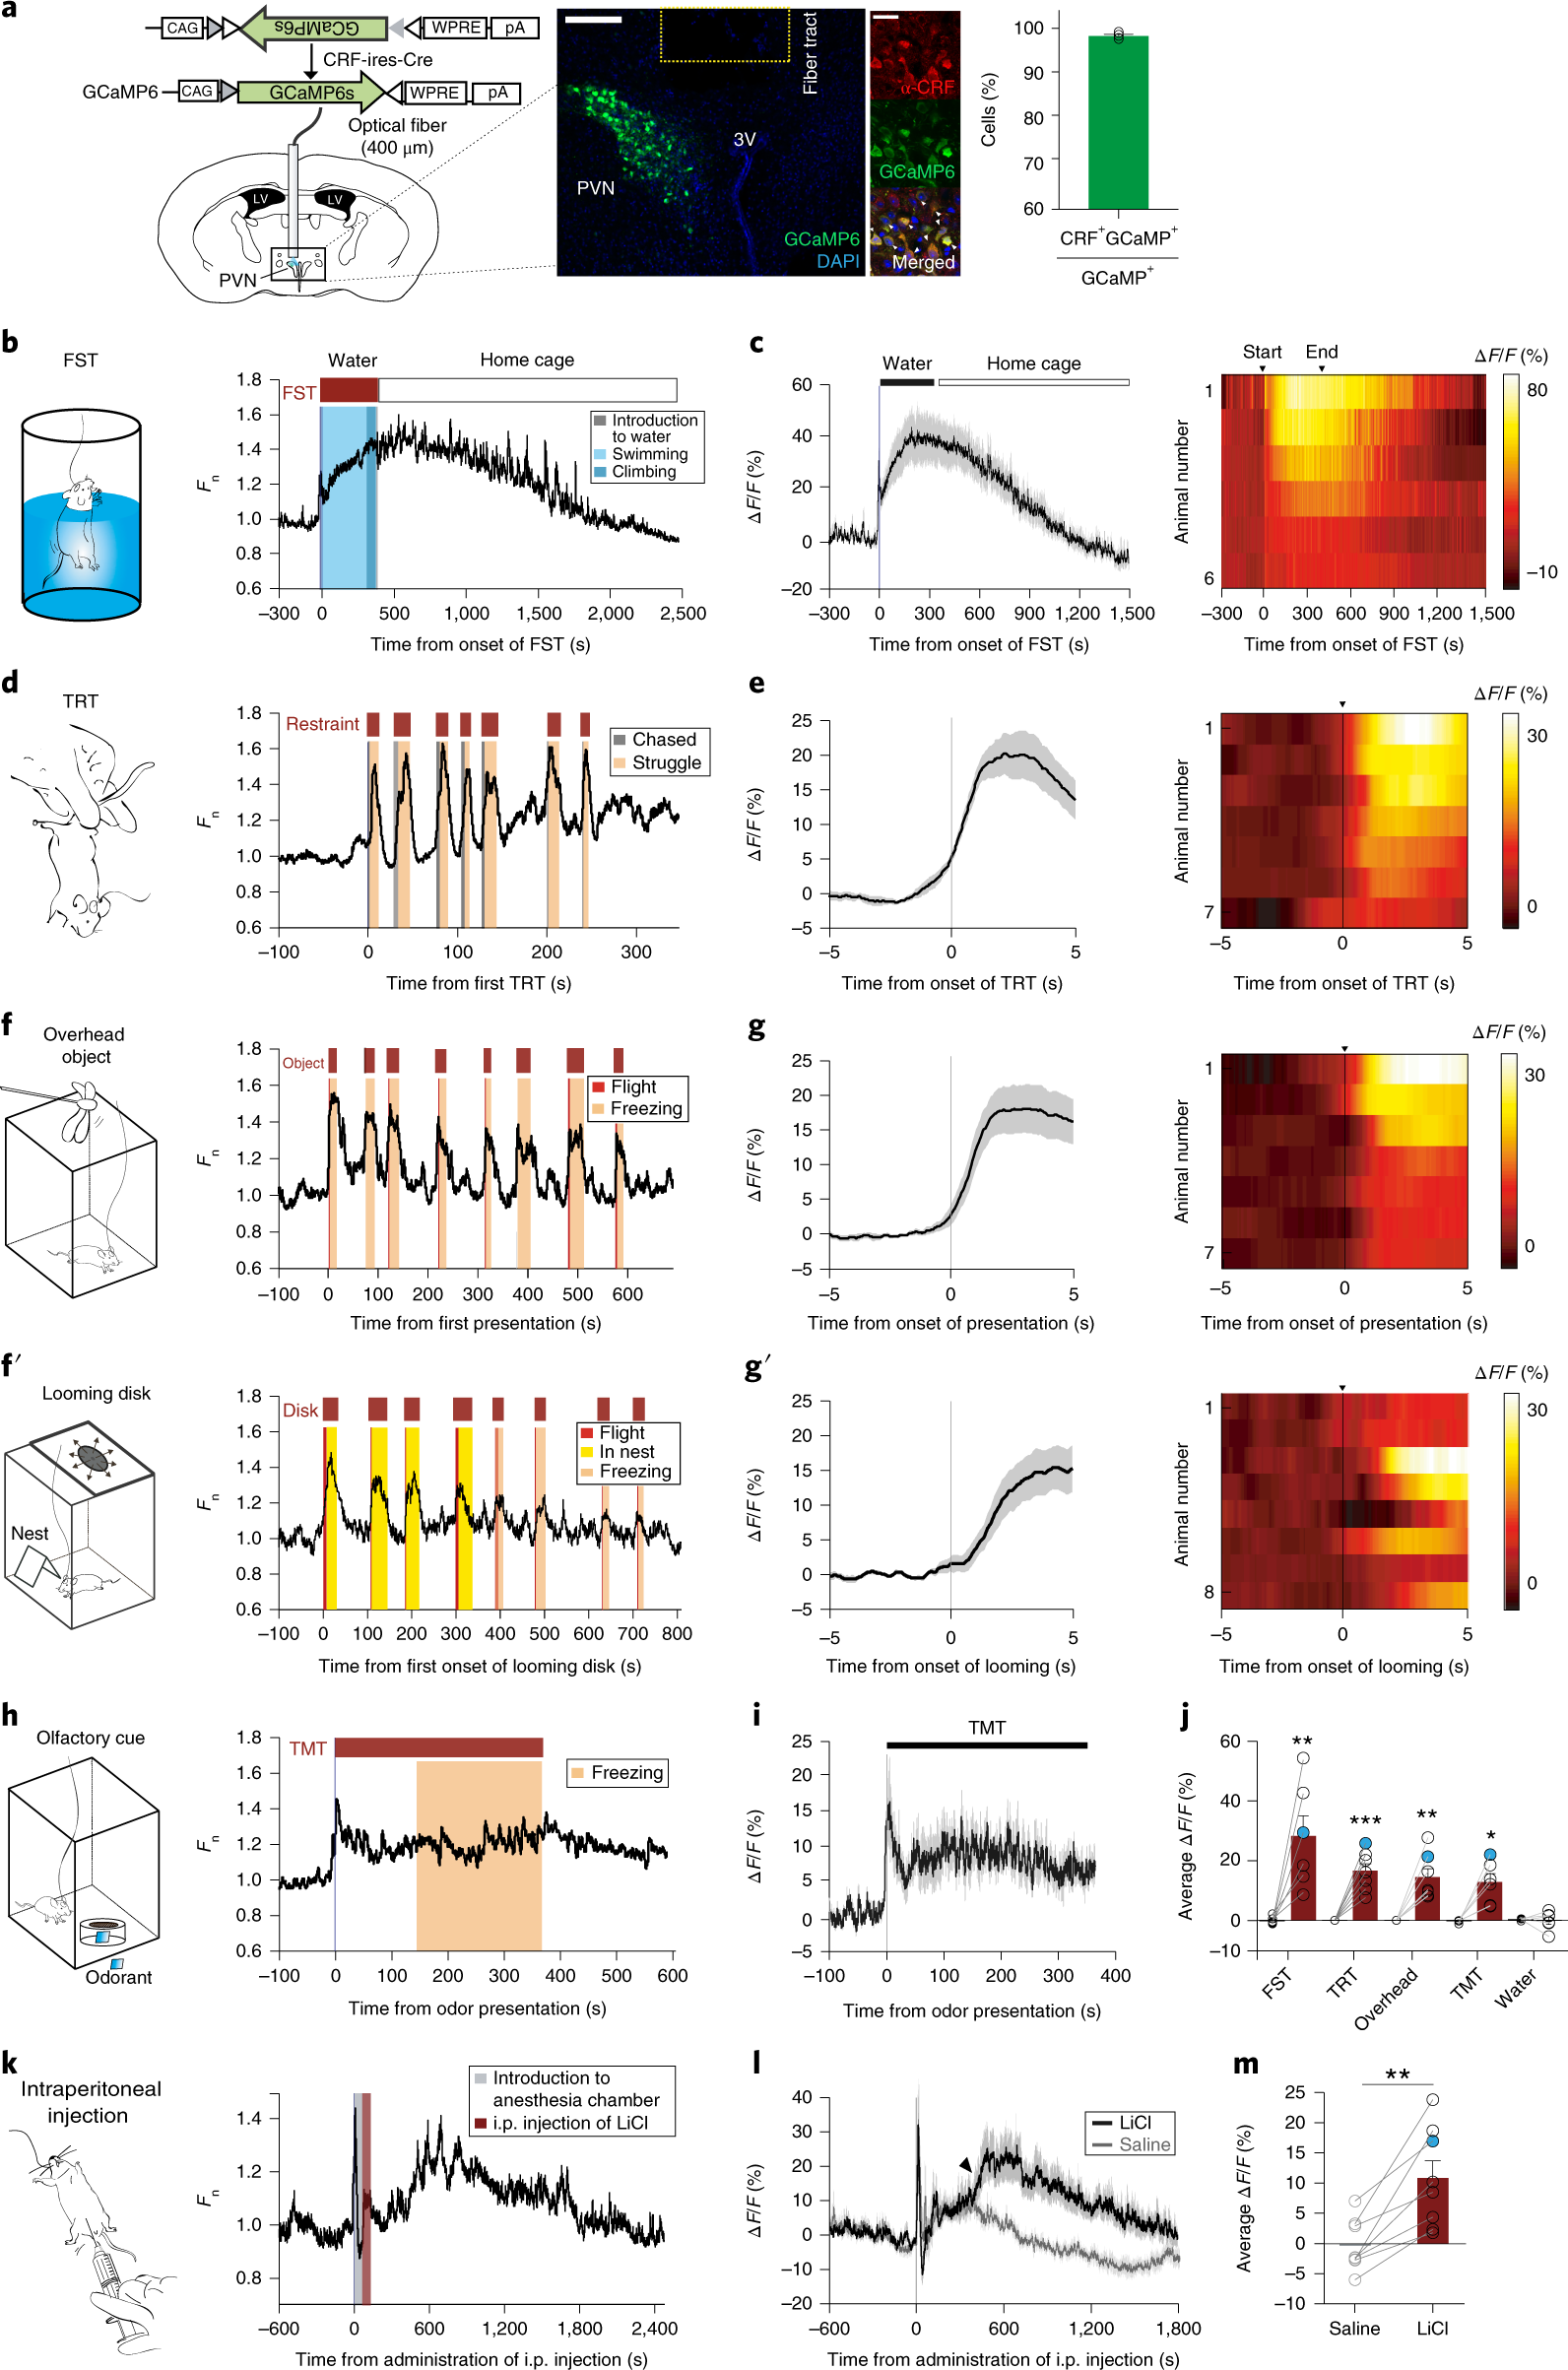 Rapid Biphasic Crf Neuronal Responses Encode Positive And Negative Valence Nature Neuroscience